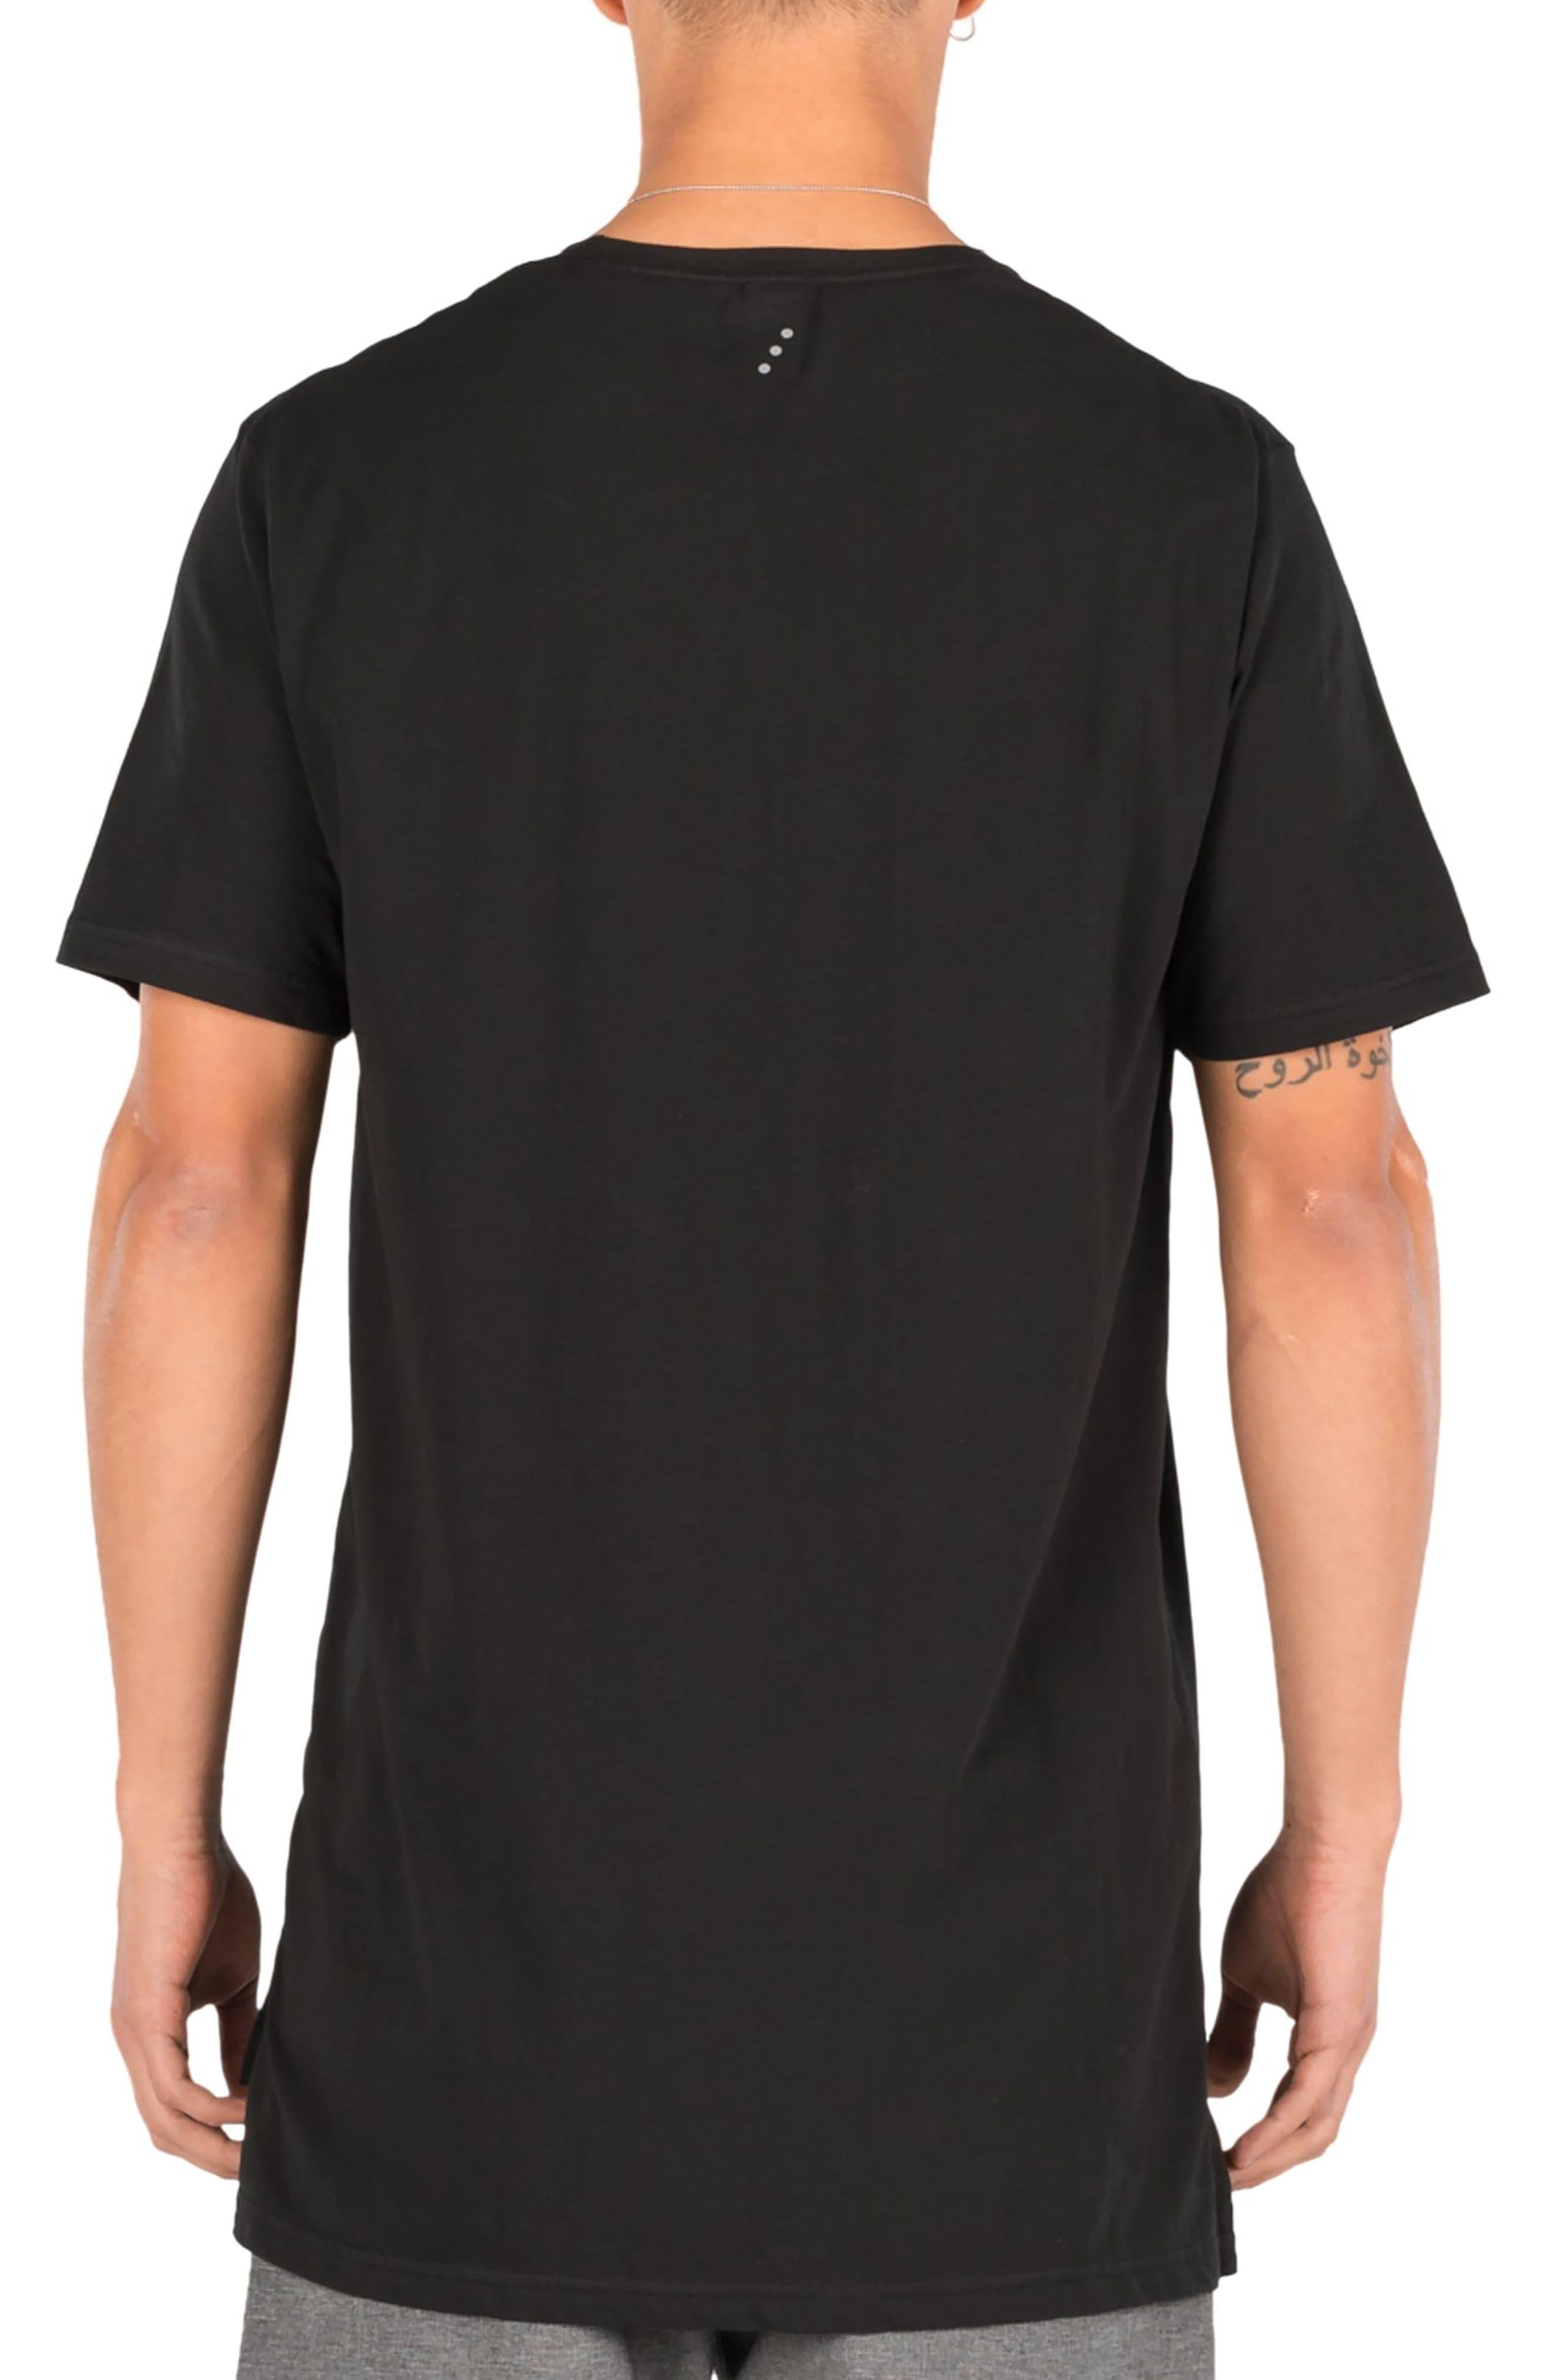 Flintlock Performance T-Shirt,                             Alternate thumbnail 2, color,                             Black